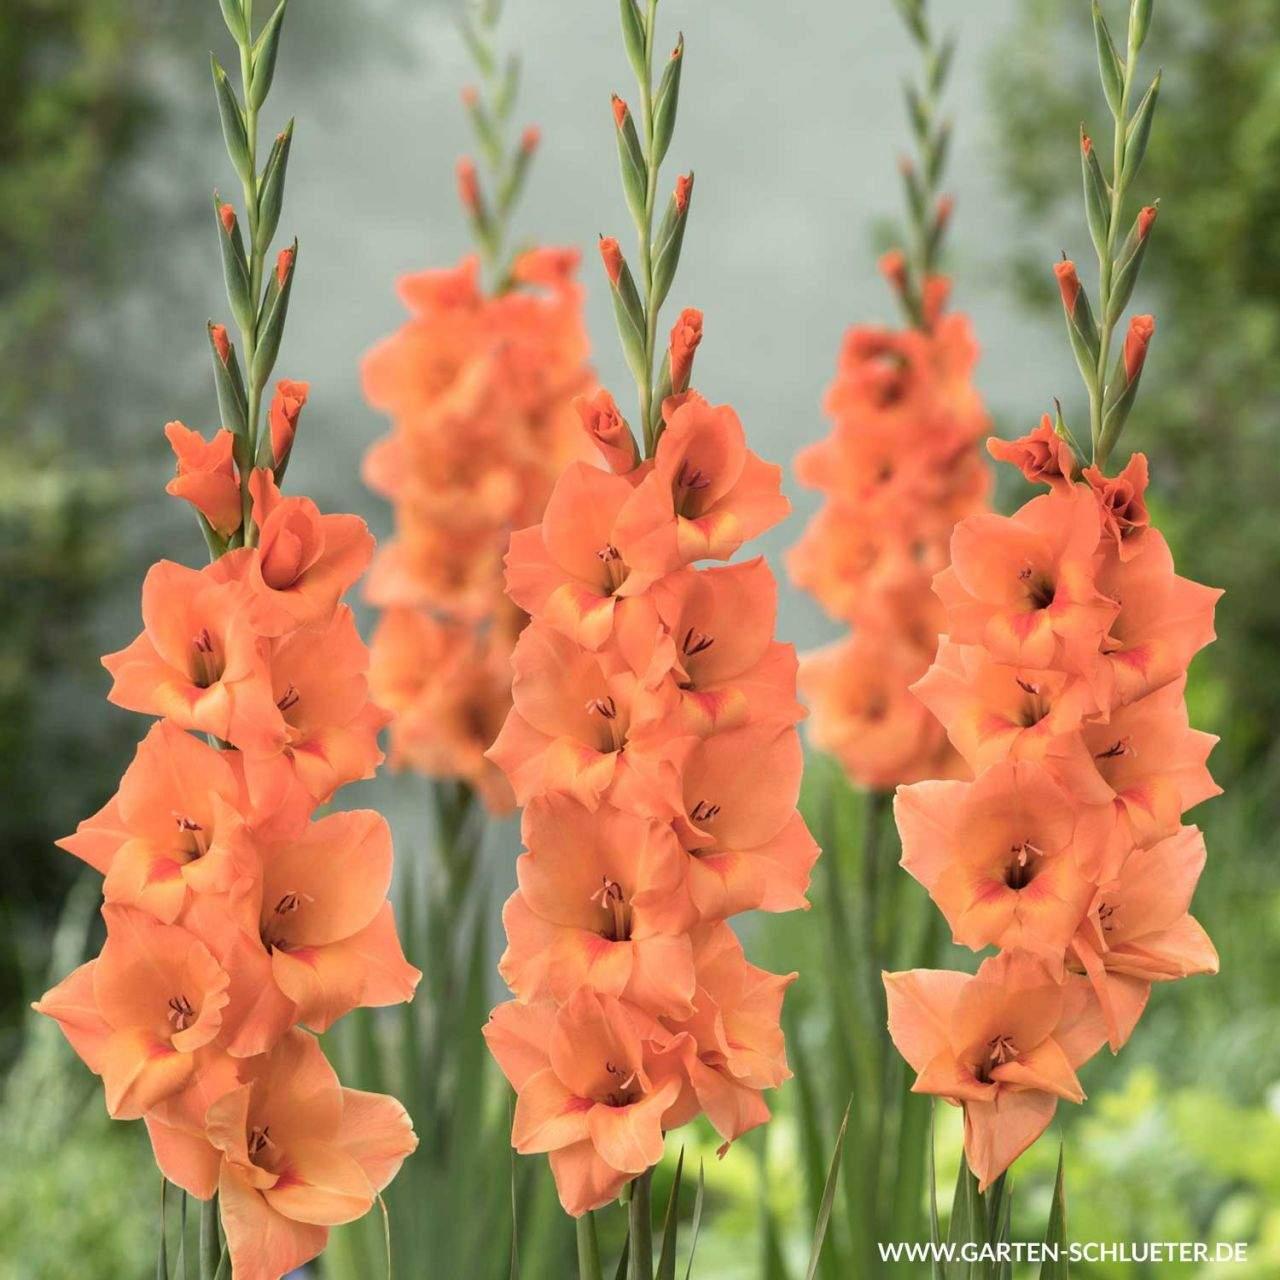 1 Gladiole Peter Pears 10 Stueck Gladiolus 1280x1280